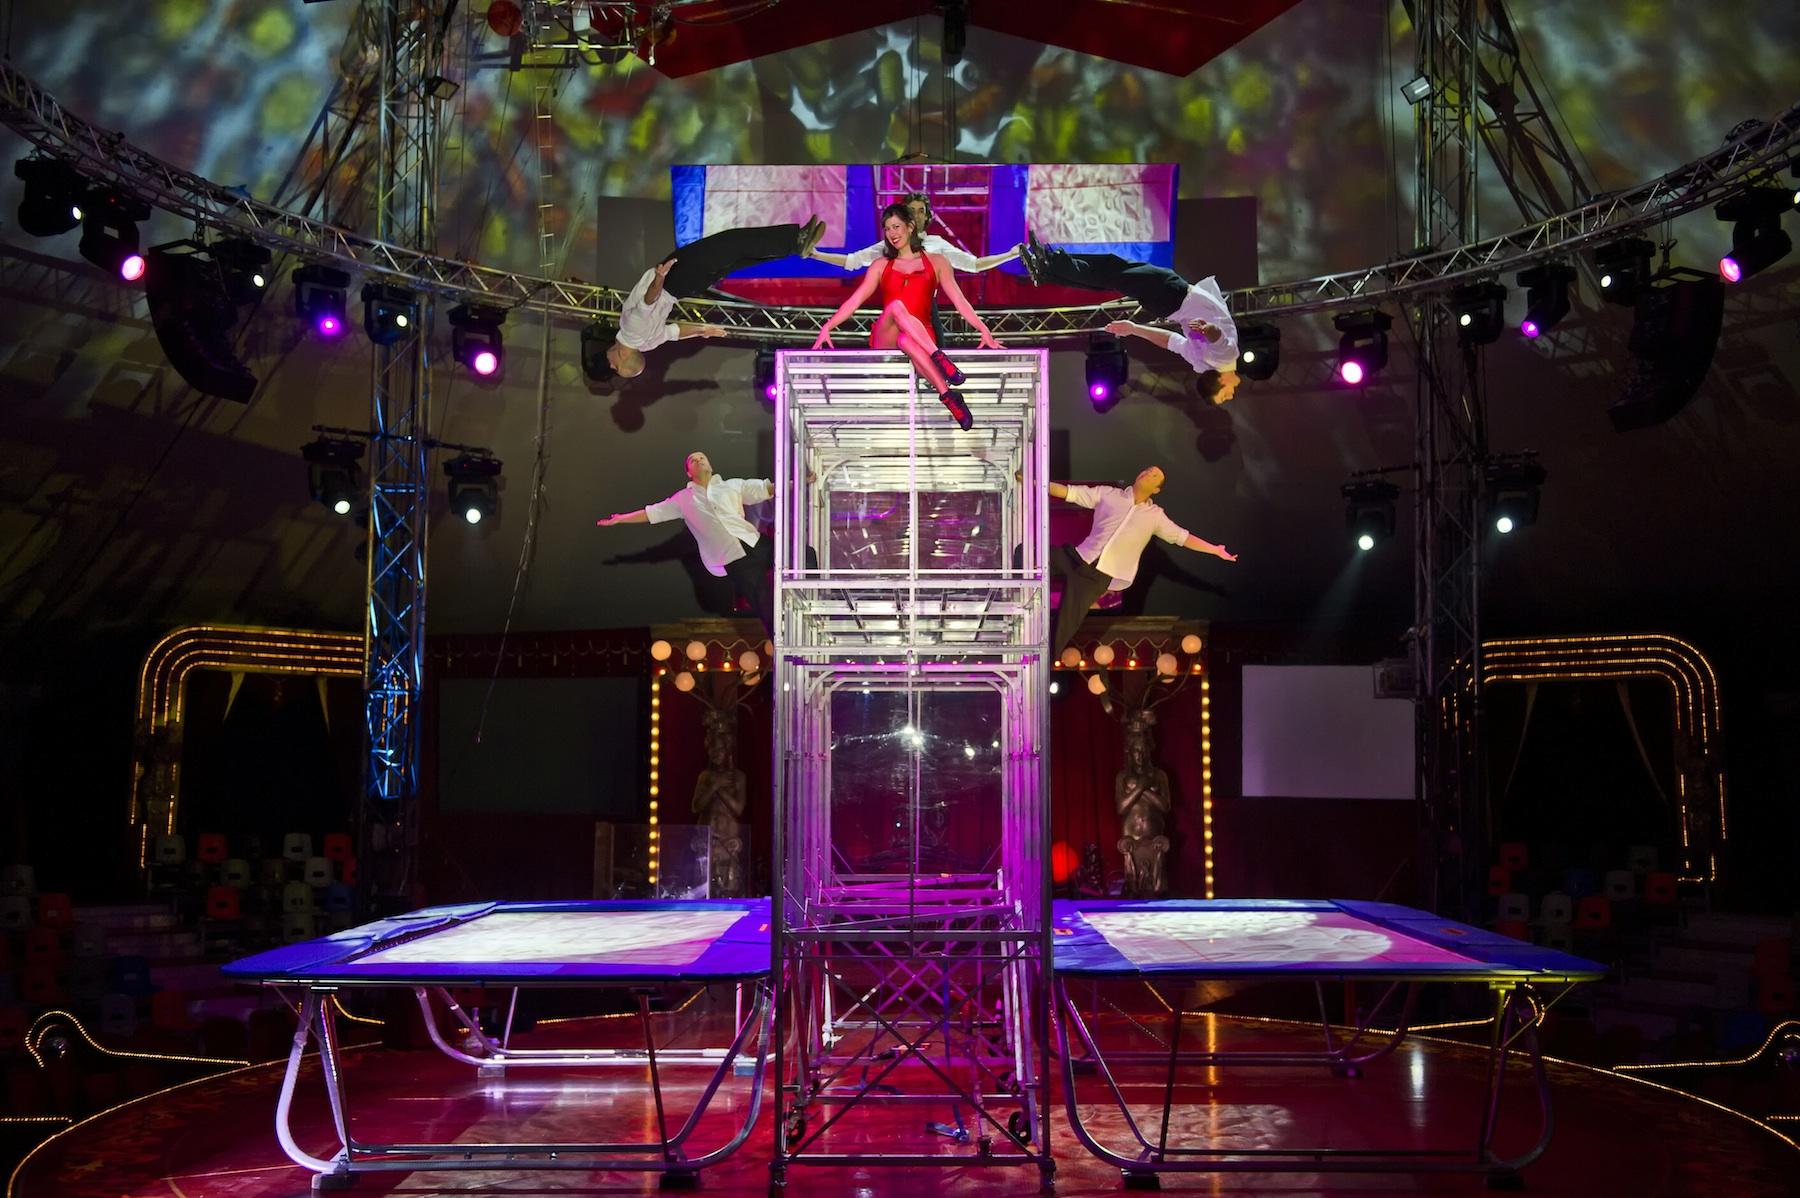 Stage trampoline show